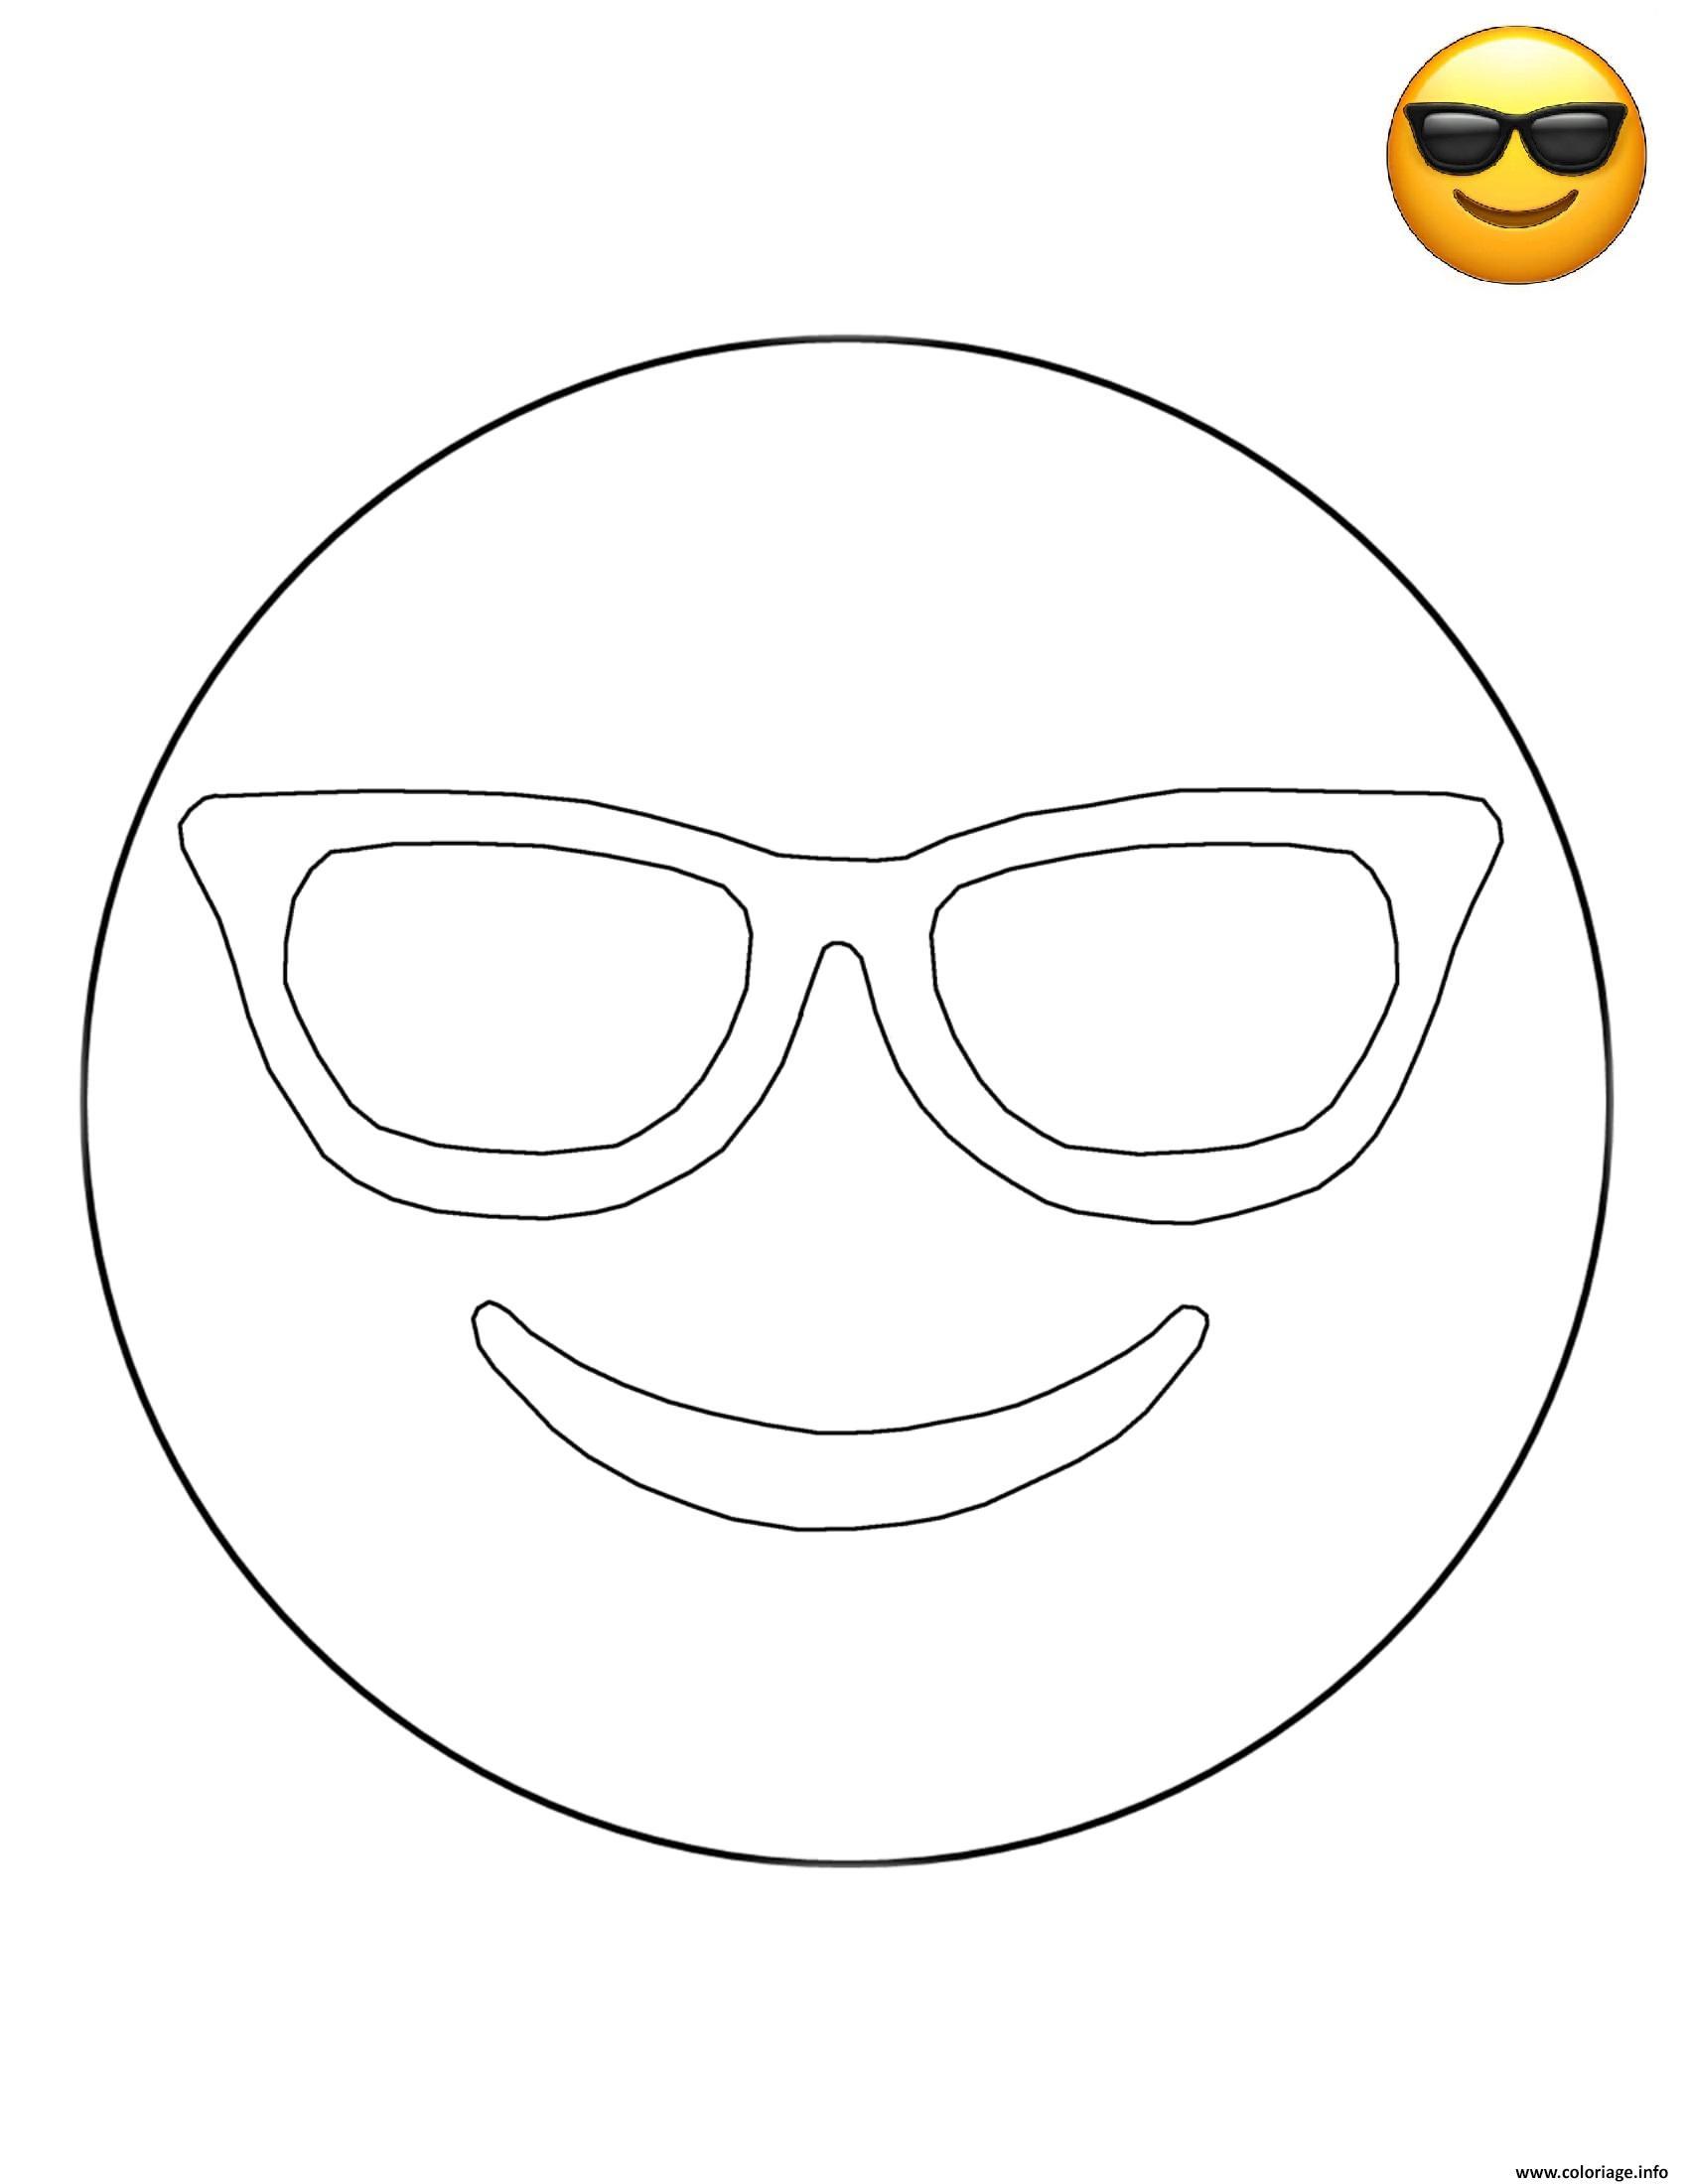 Coloriage A Imprimer Smiley.Coloriage Emoji Sunglasses Smiley Jecolorie Com